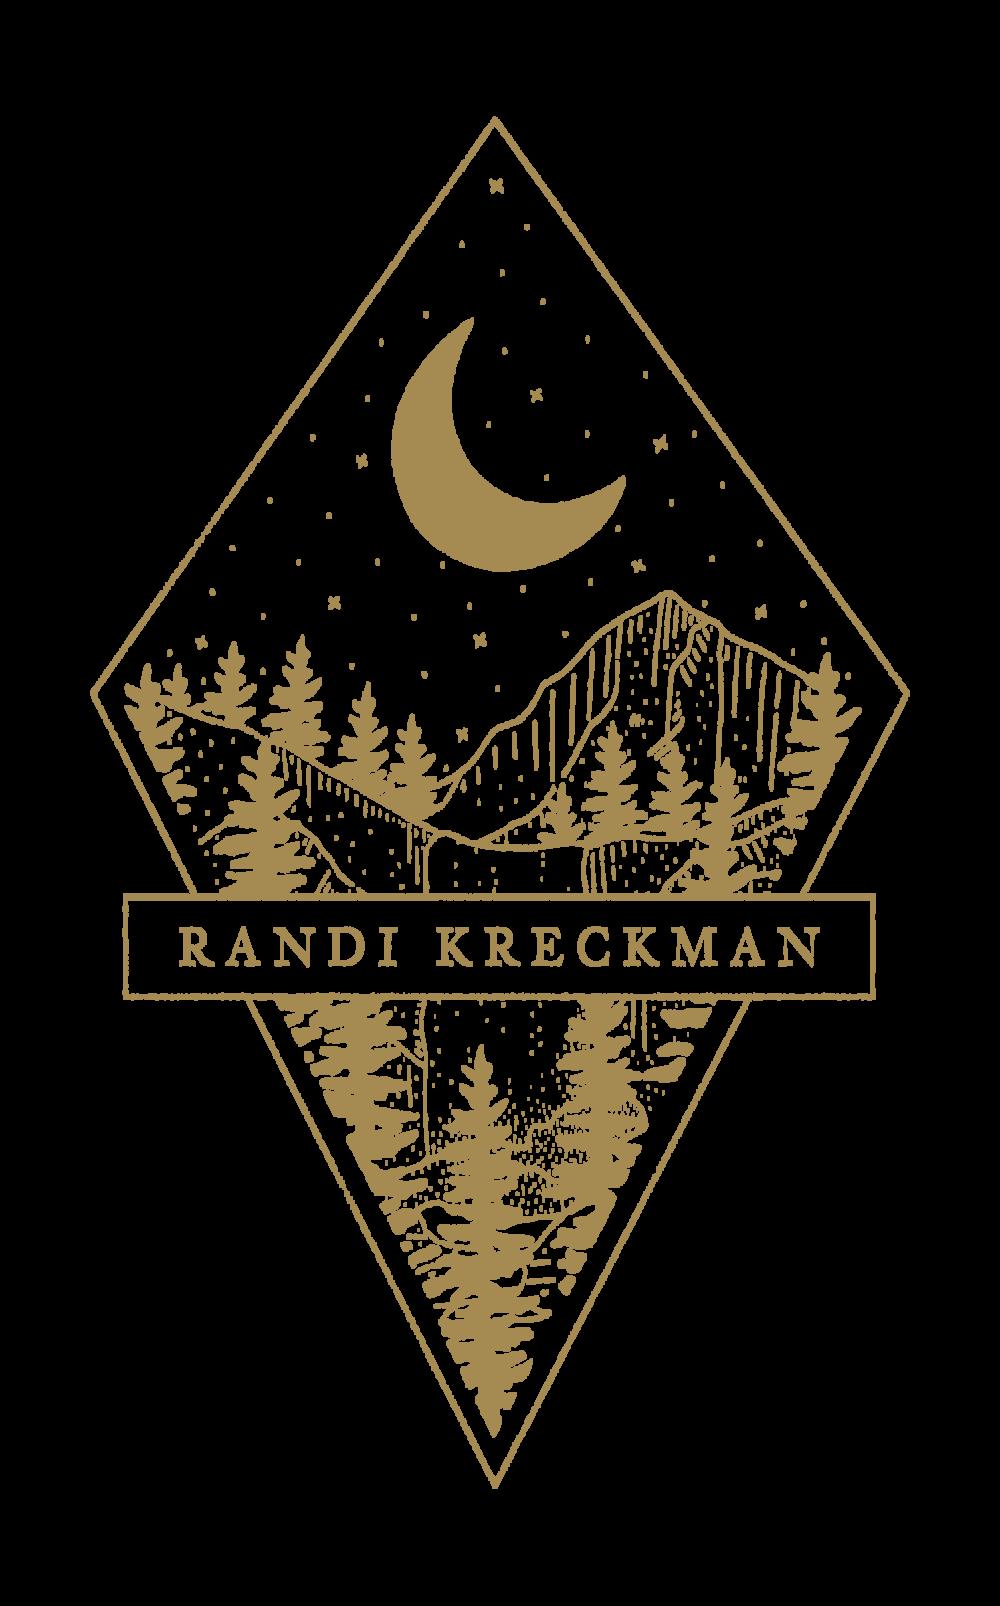 randi k-main logos-05.png